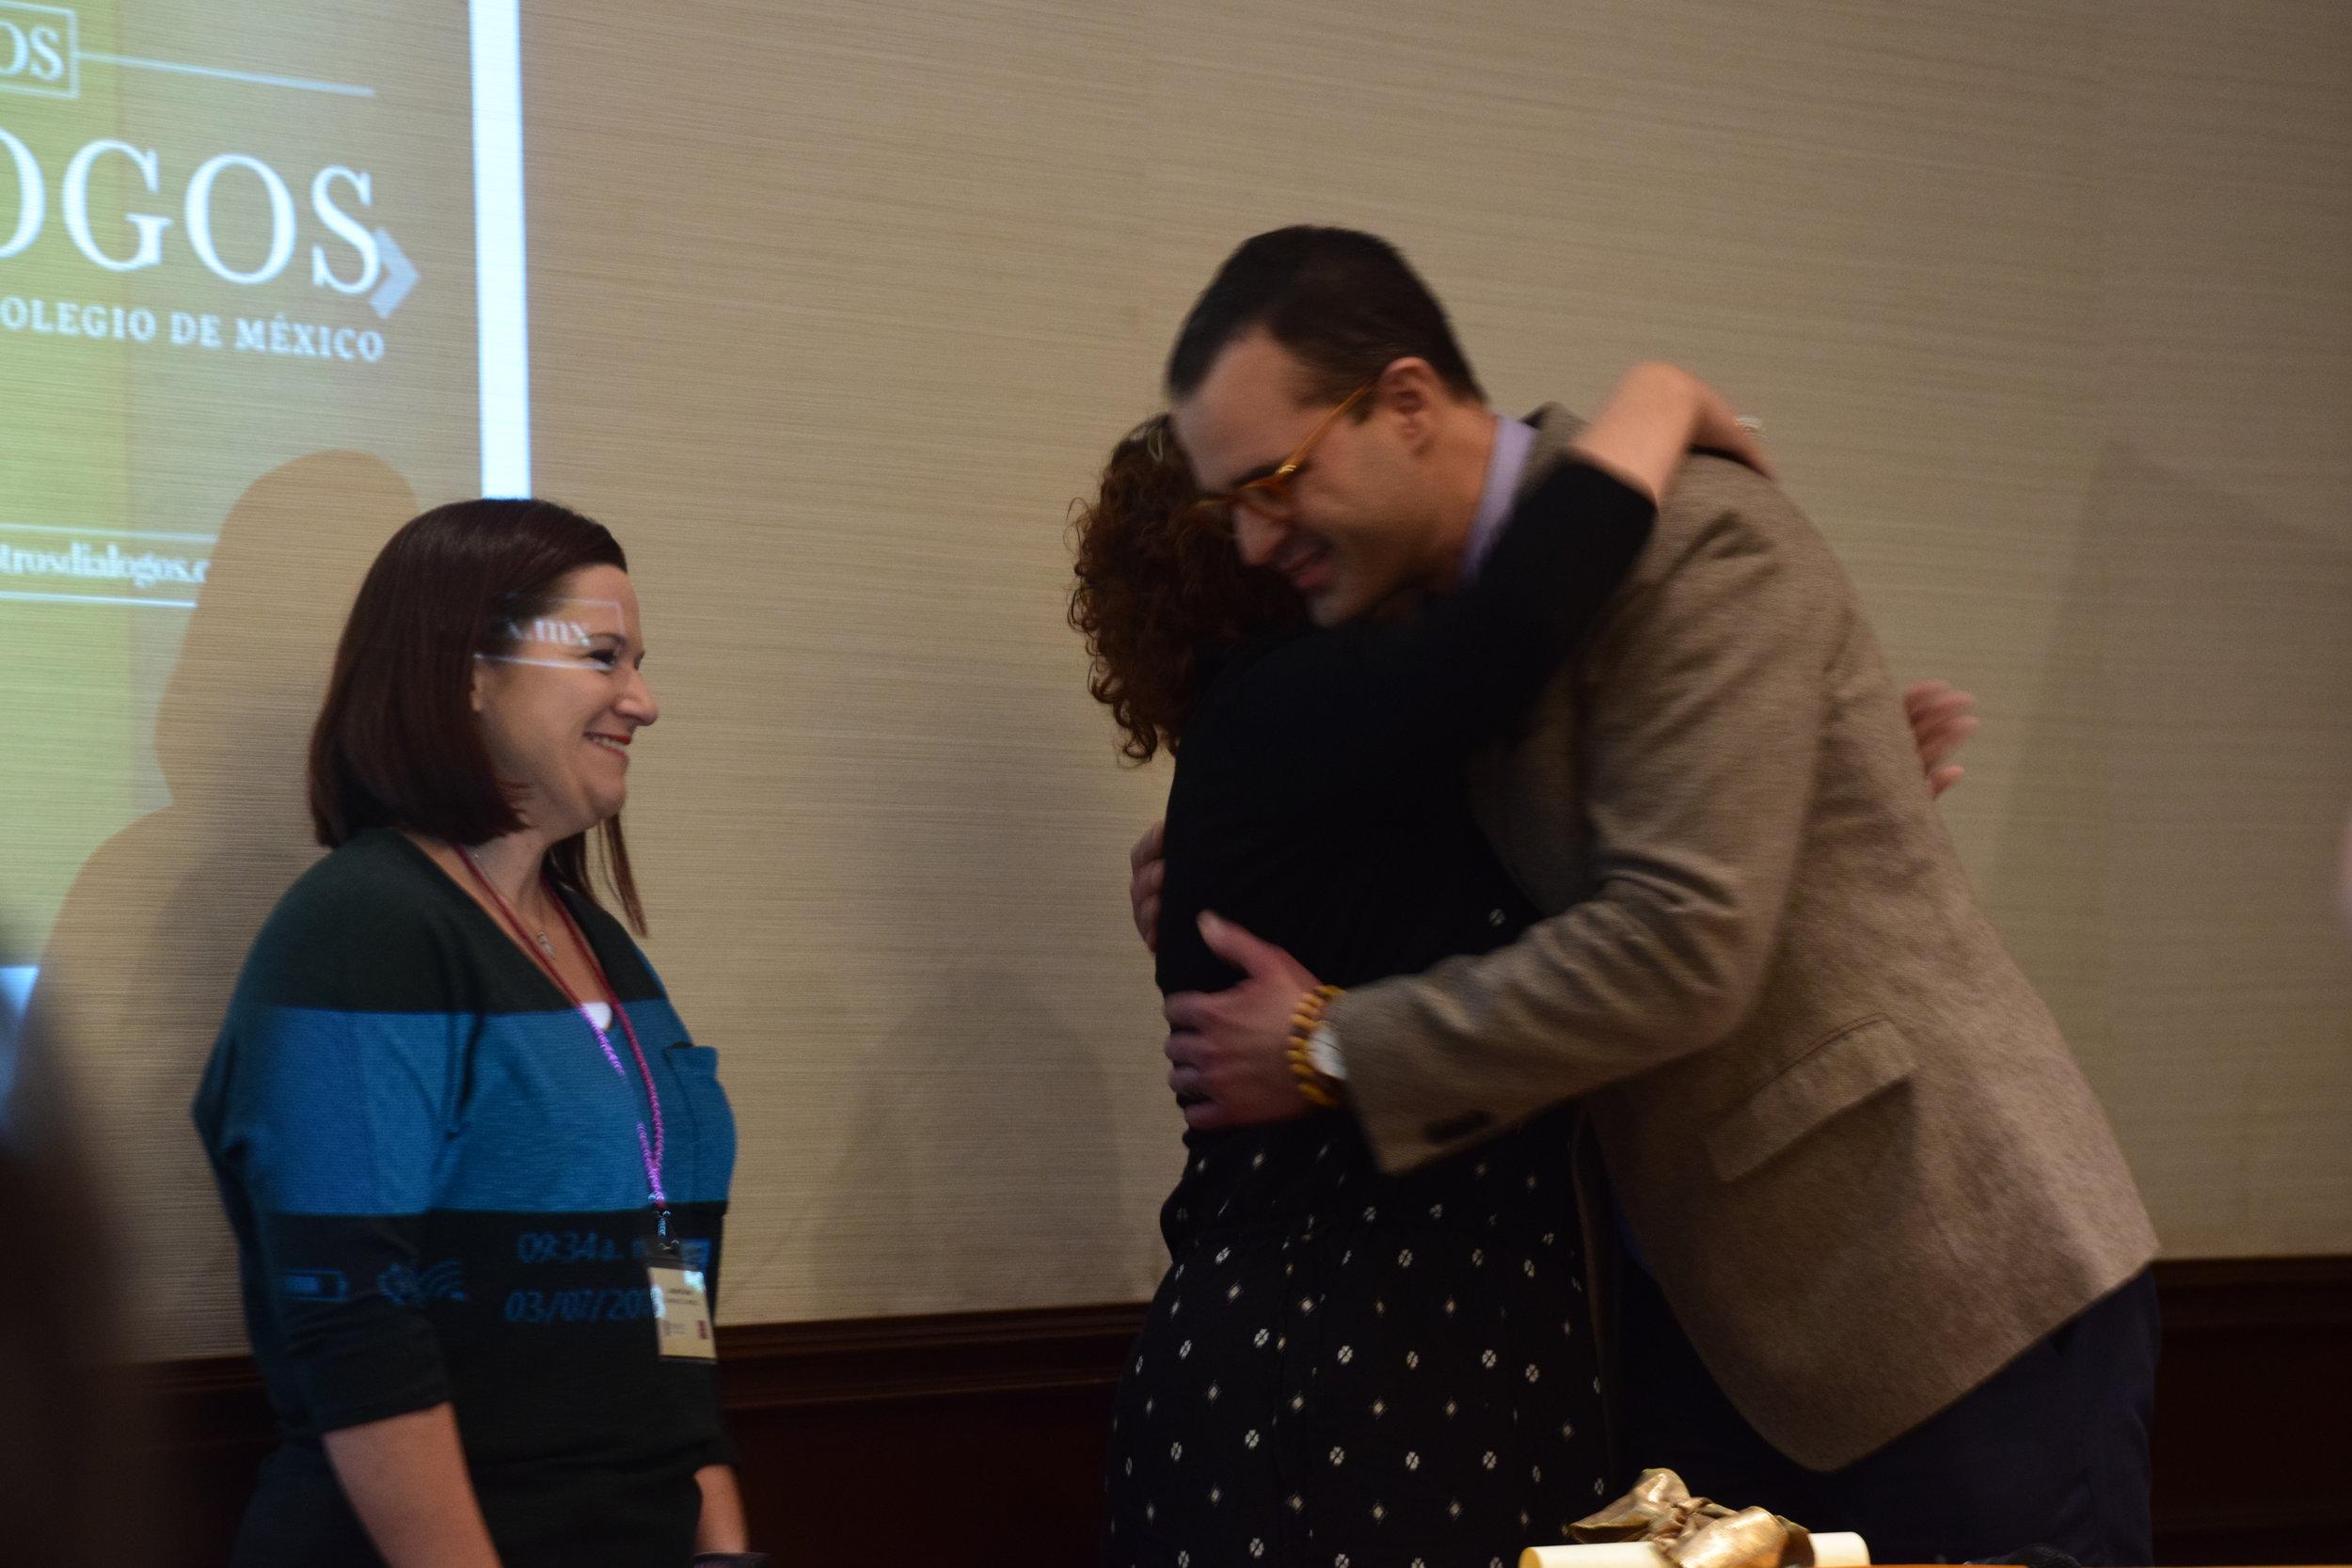 Antonio Sotomayor presents the José Toribio Medina Award to Jennifer Snow and Marisol Ramos/Photo: ESENDOM.